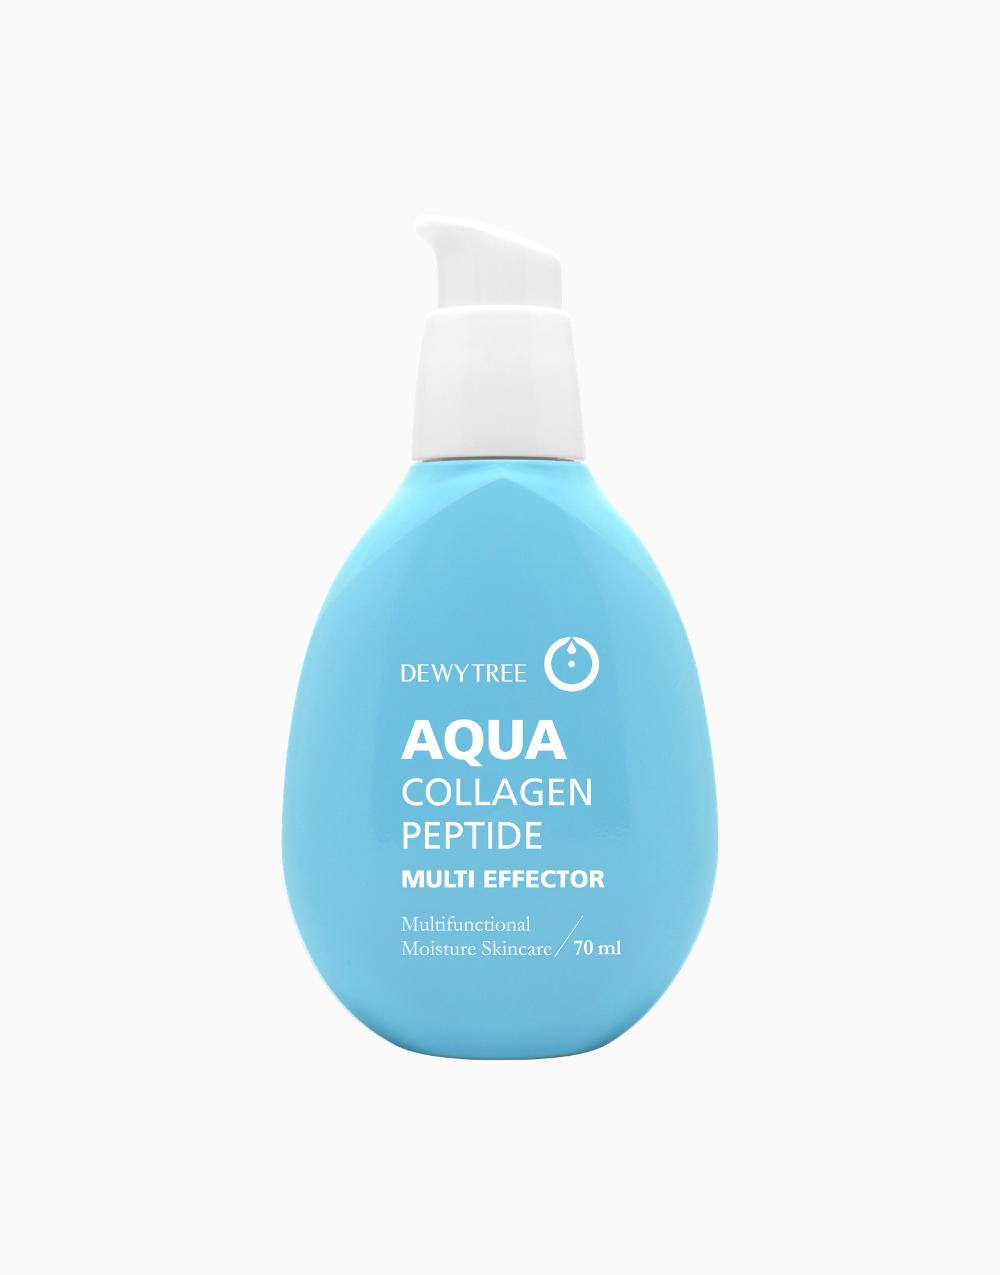 Aqua Collagen Peptide Multi Effector (70ml) by Dewytree